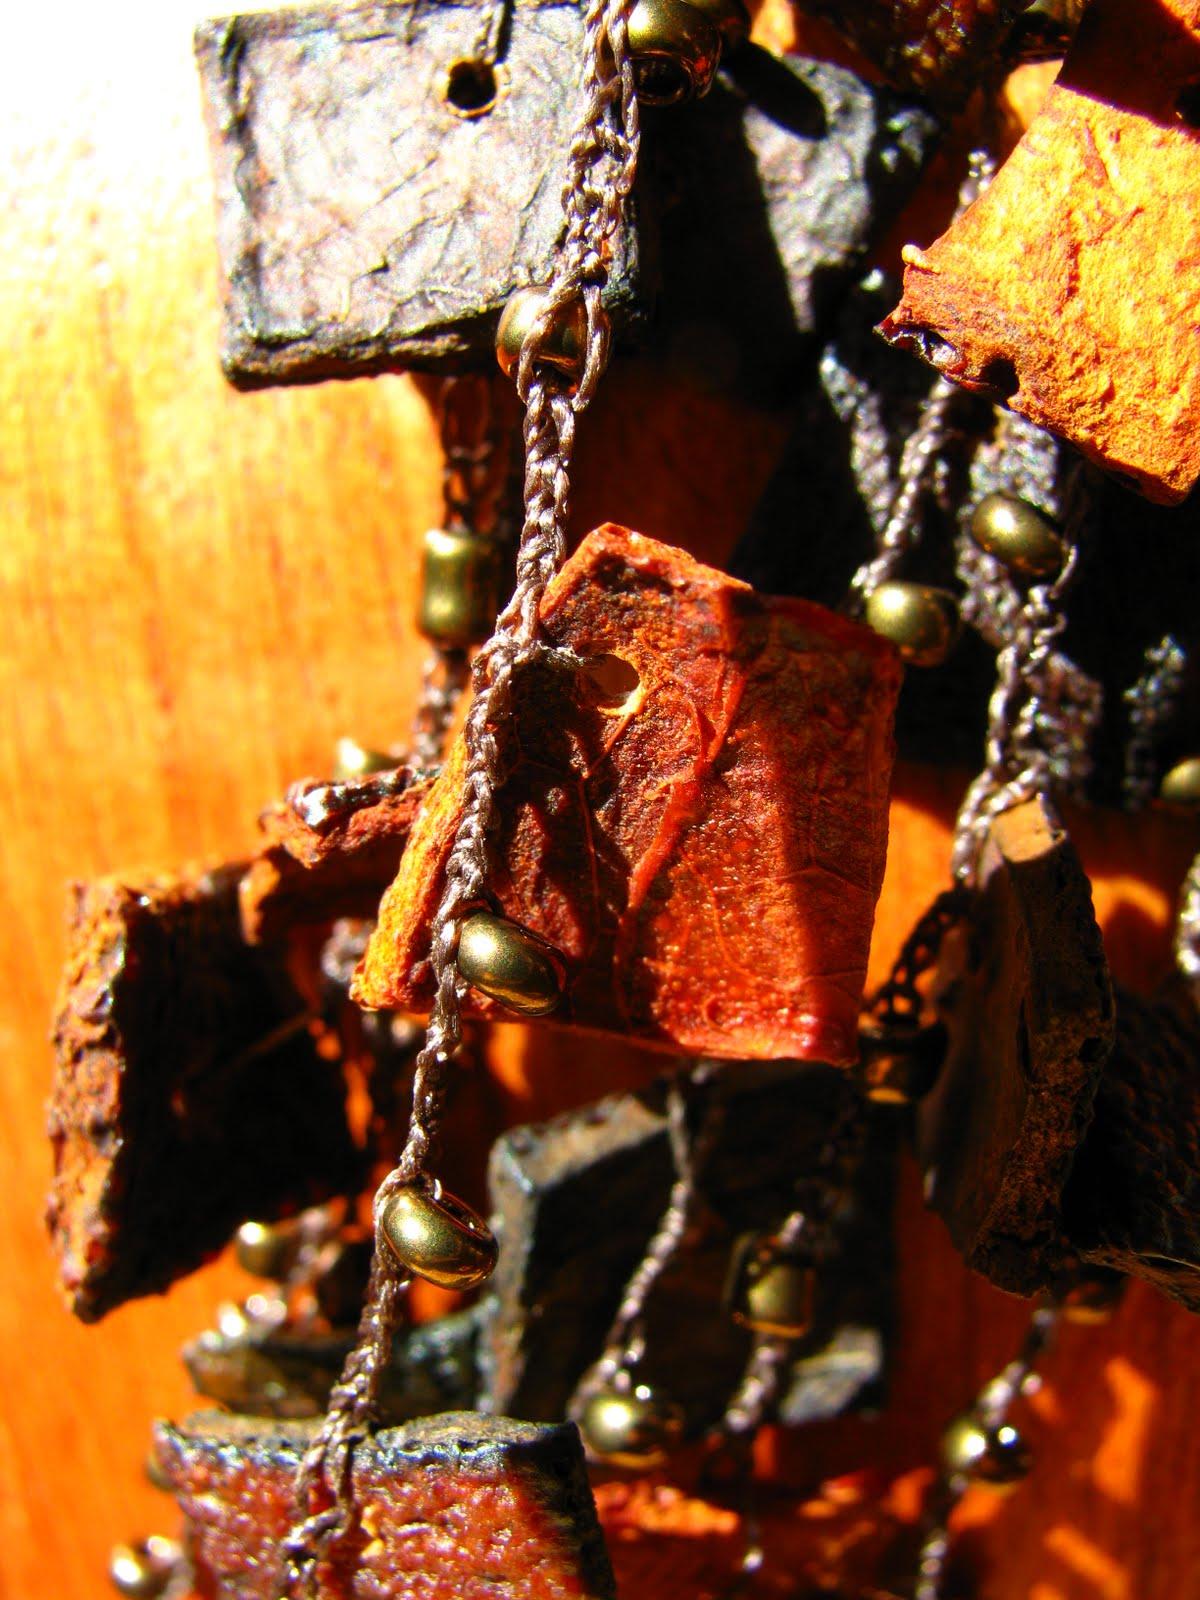 Collier ecorce d'orange